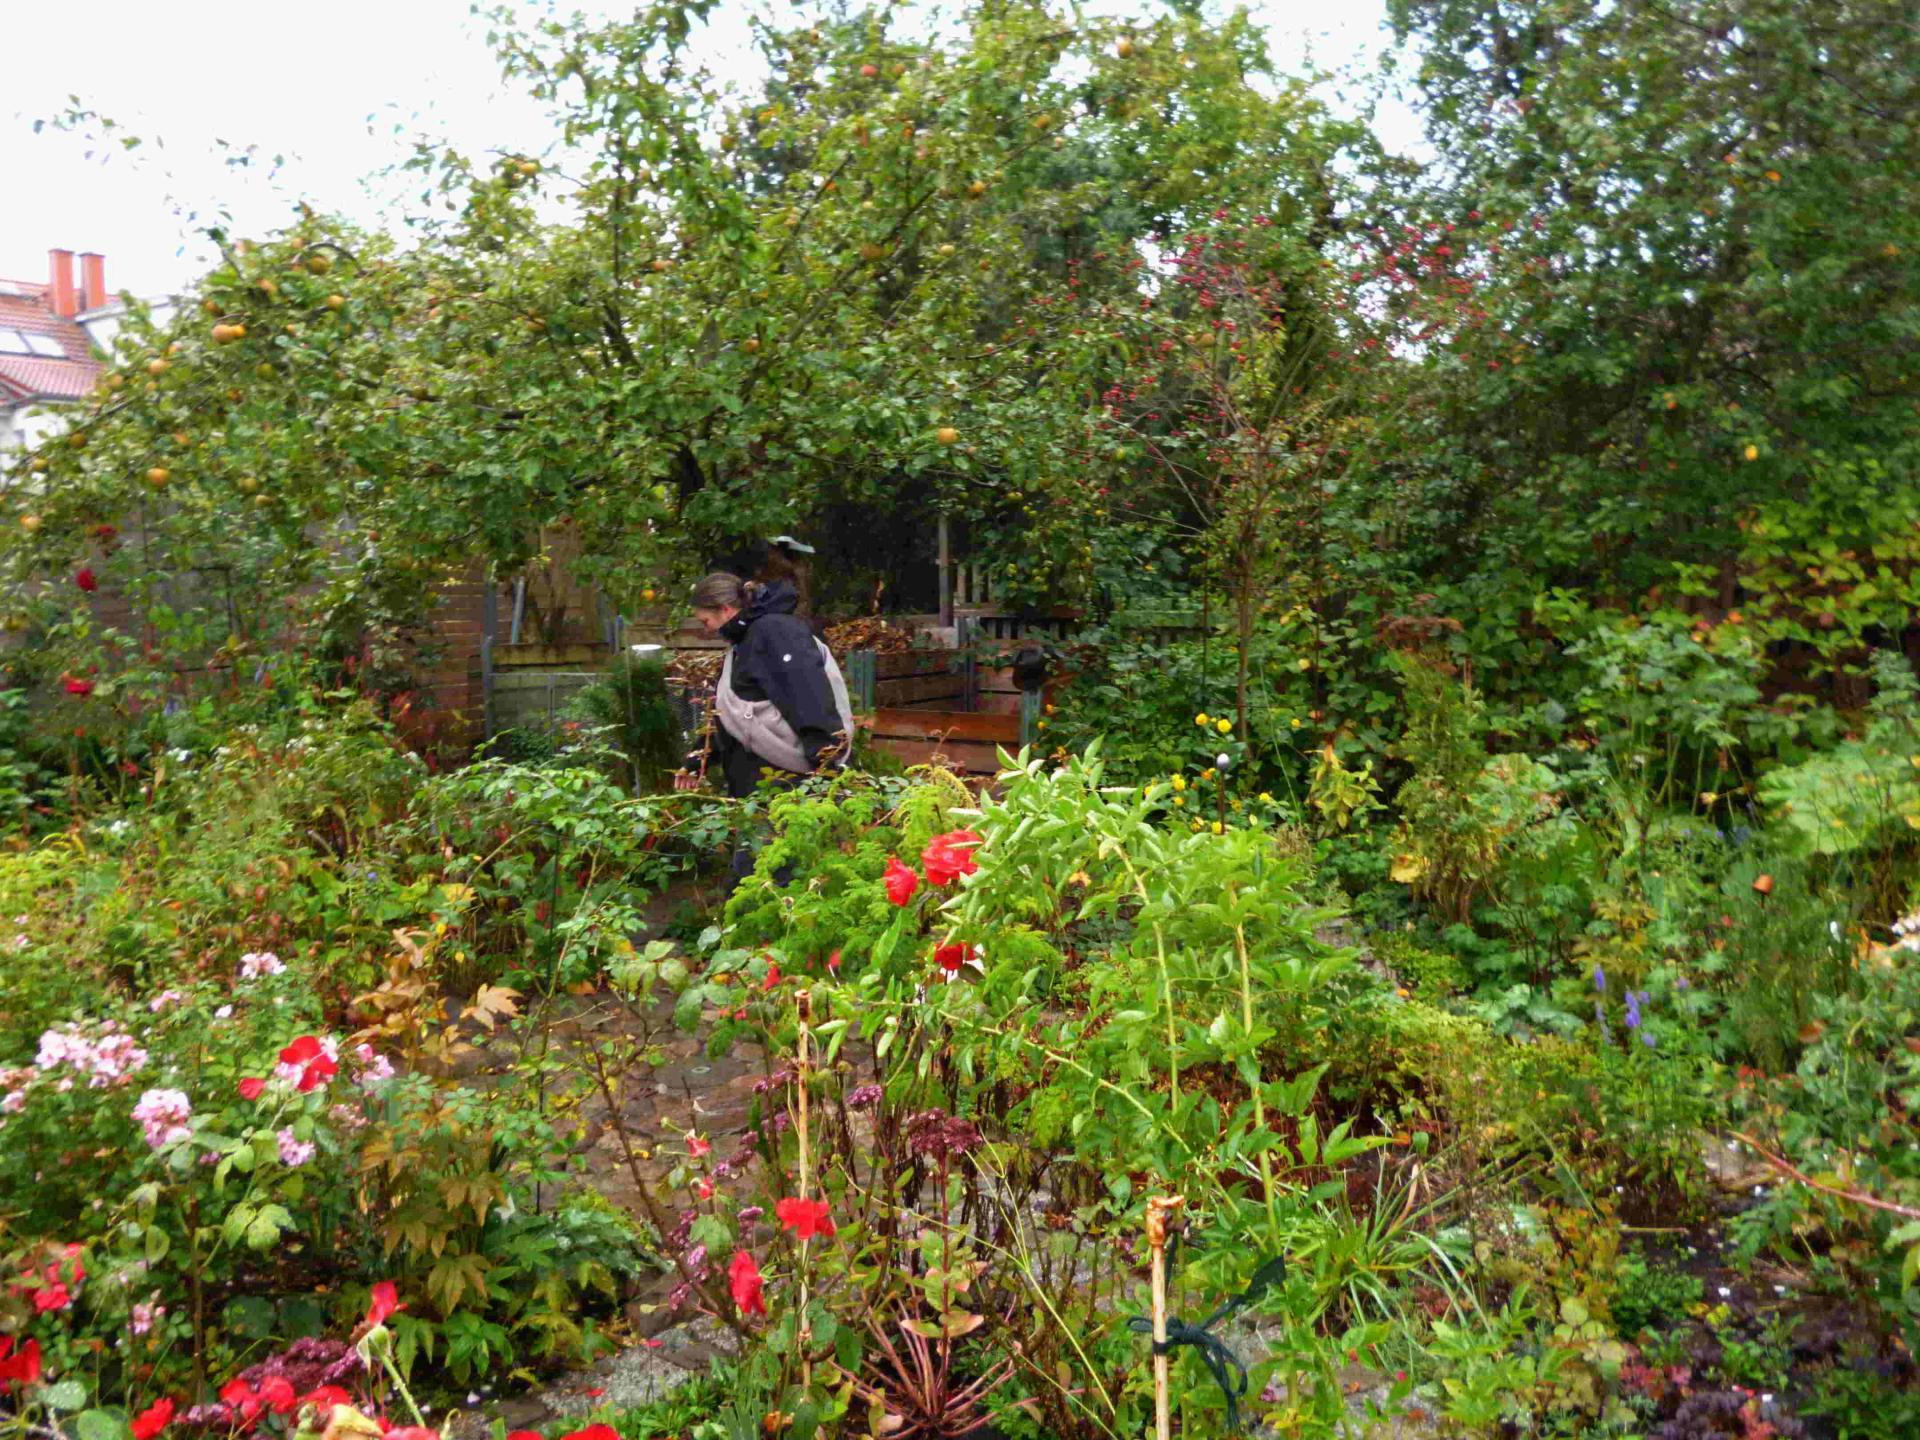 Offene Gartenpfporte 26-09-2020 Bild 20